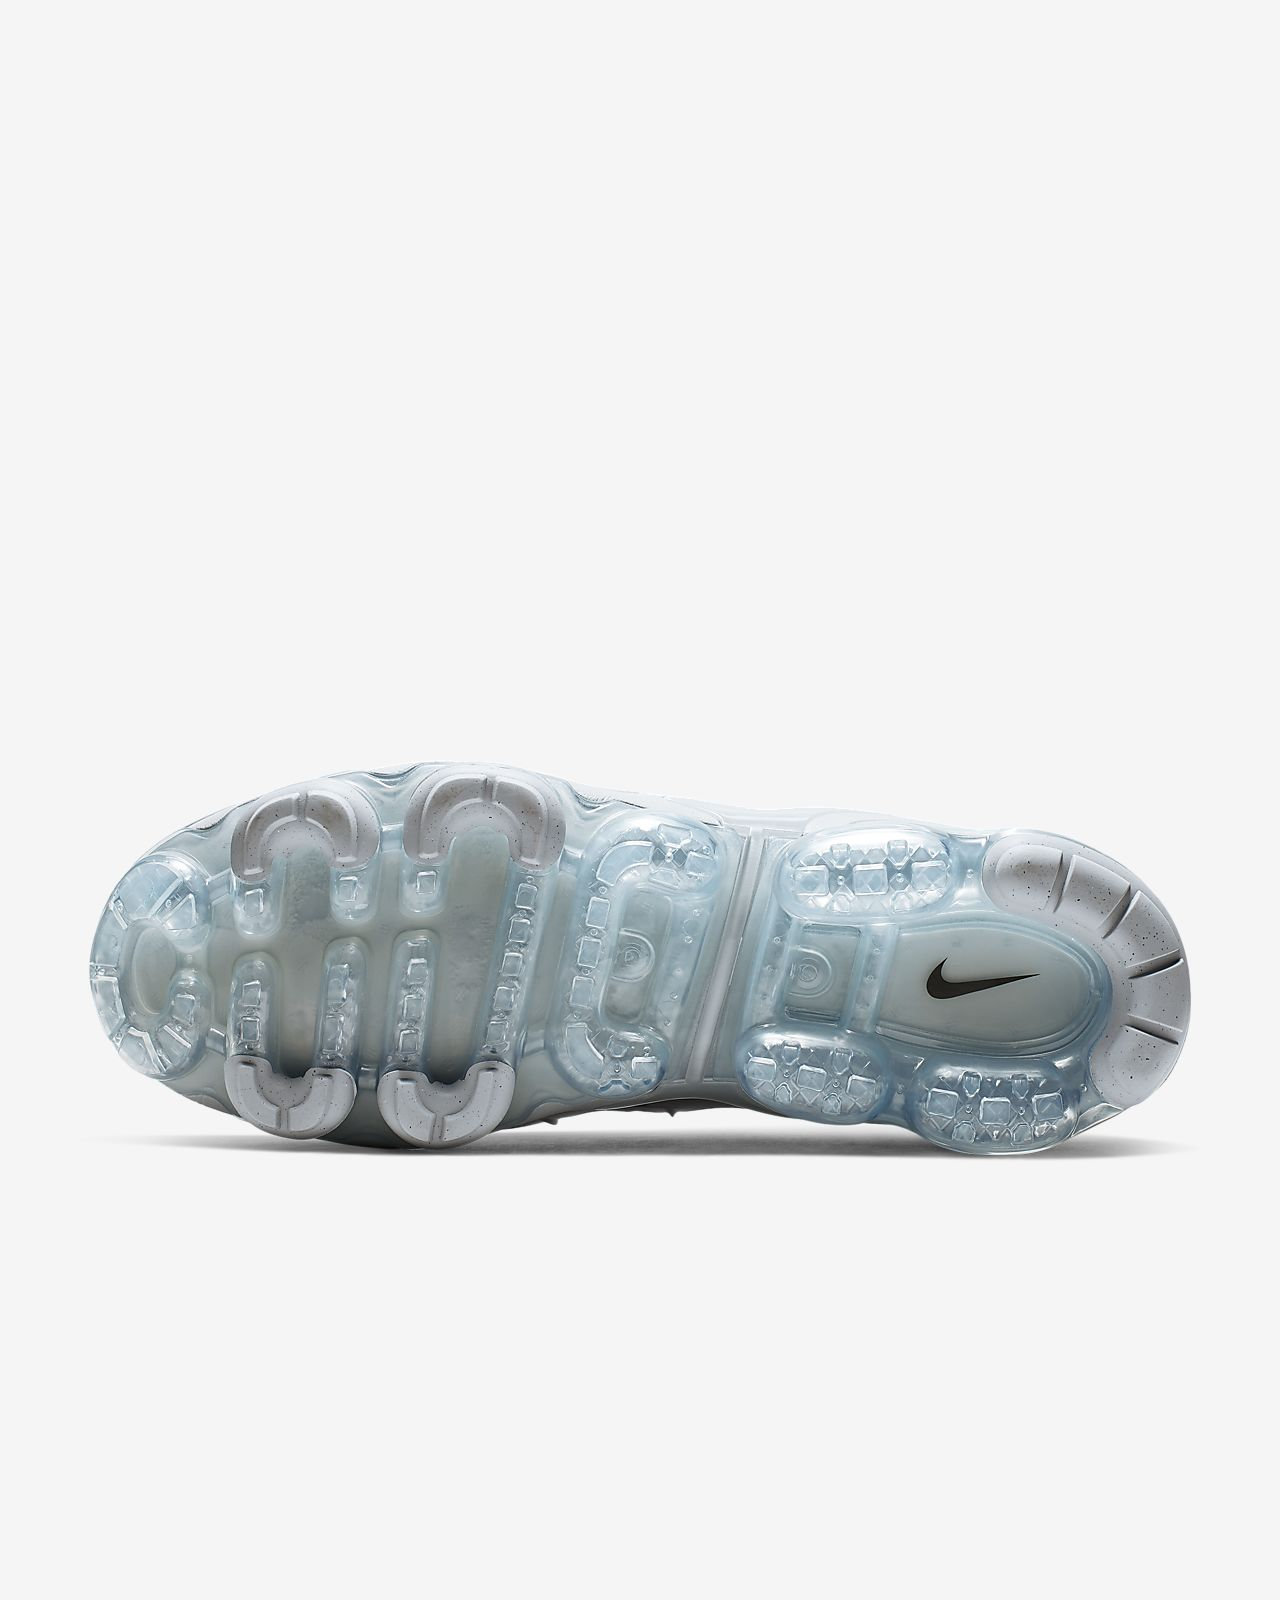 400bcae39a2f6 Nike Air VaporMax Plus Zapatillas - Hombre. Nike.com ES